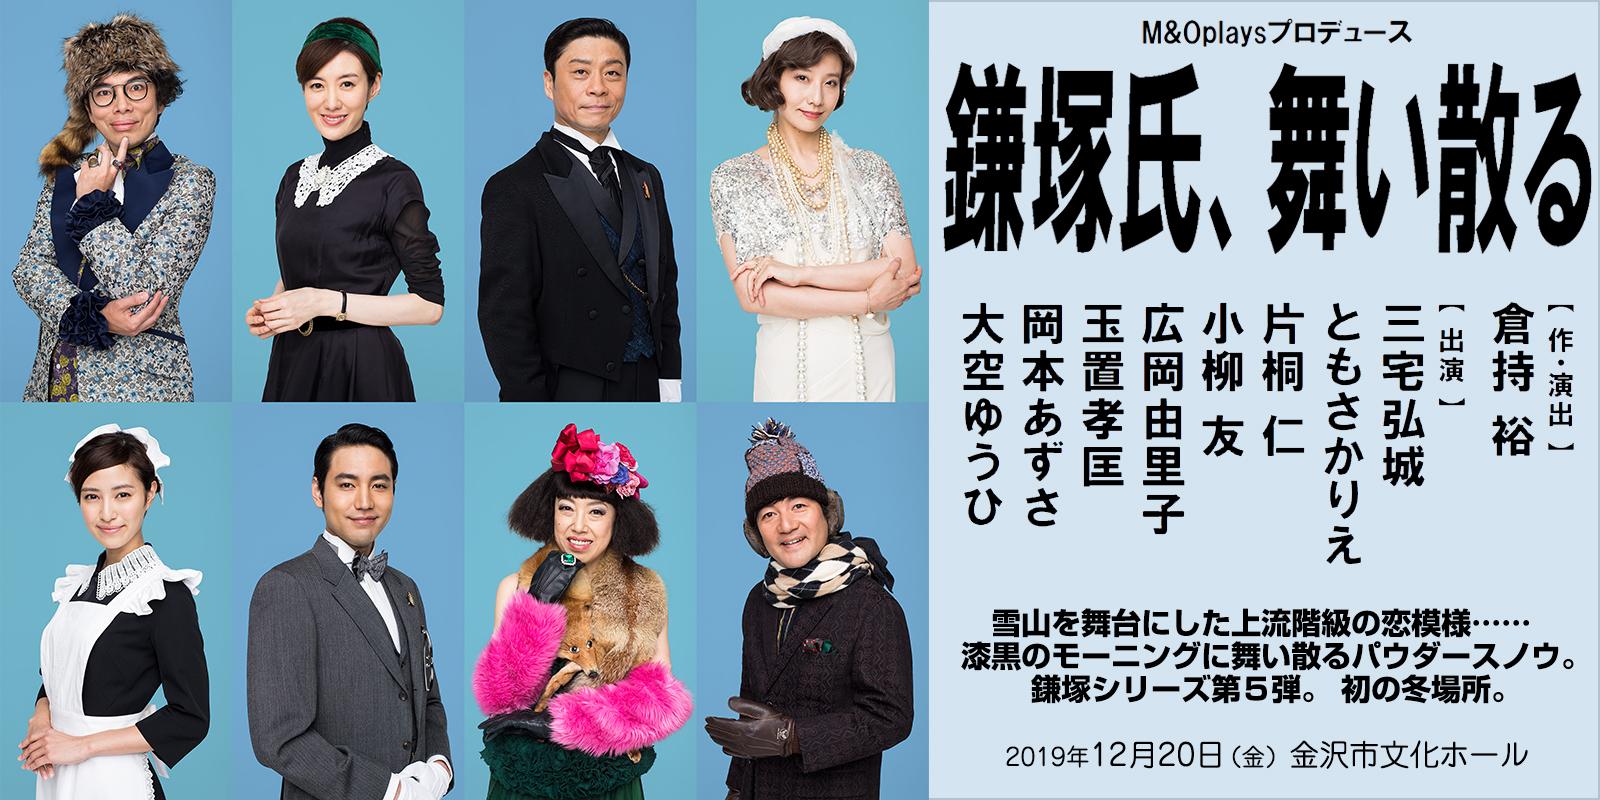 M&Oplays プロデュース 『鎌塚氏、舞い散る』